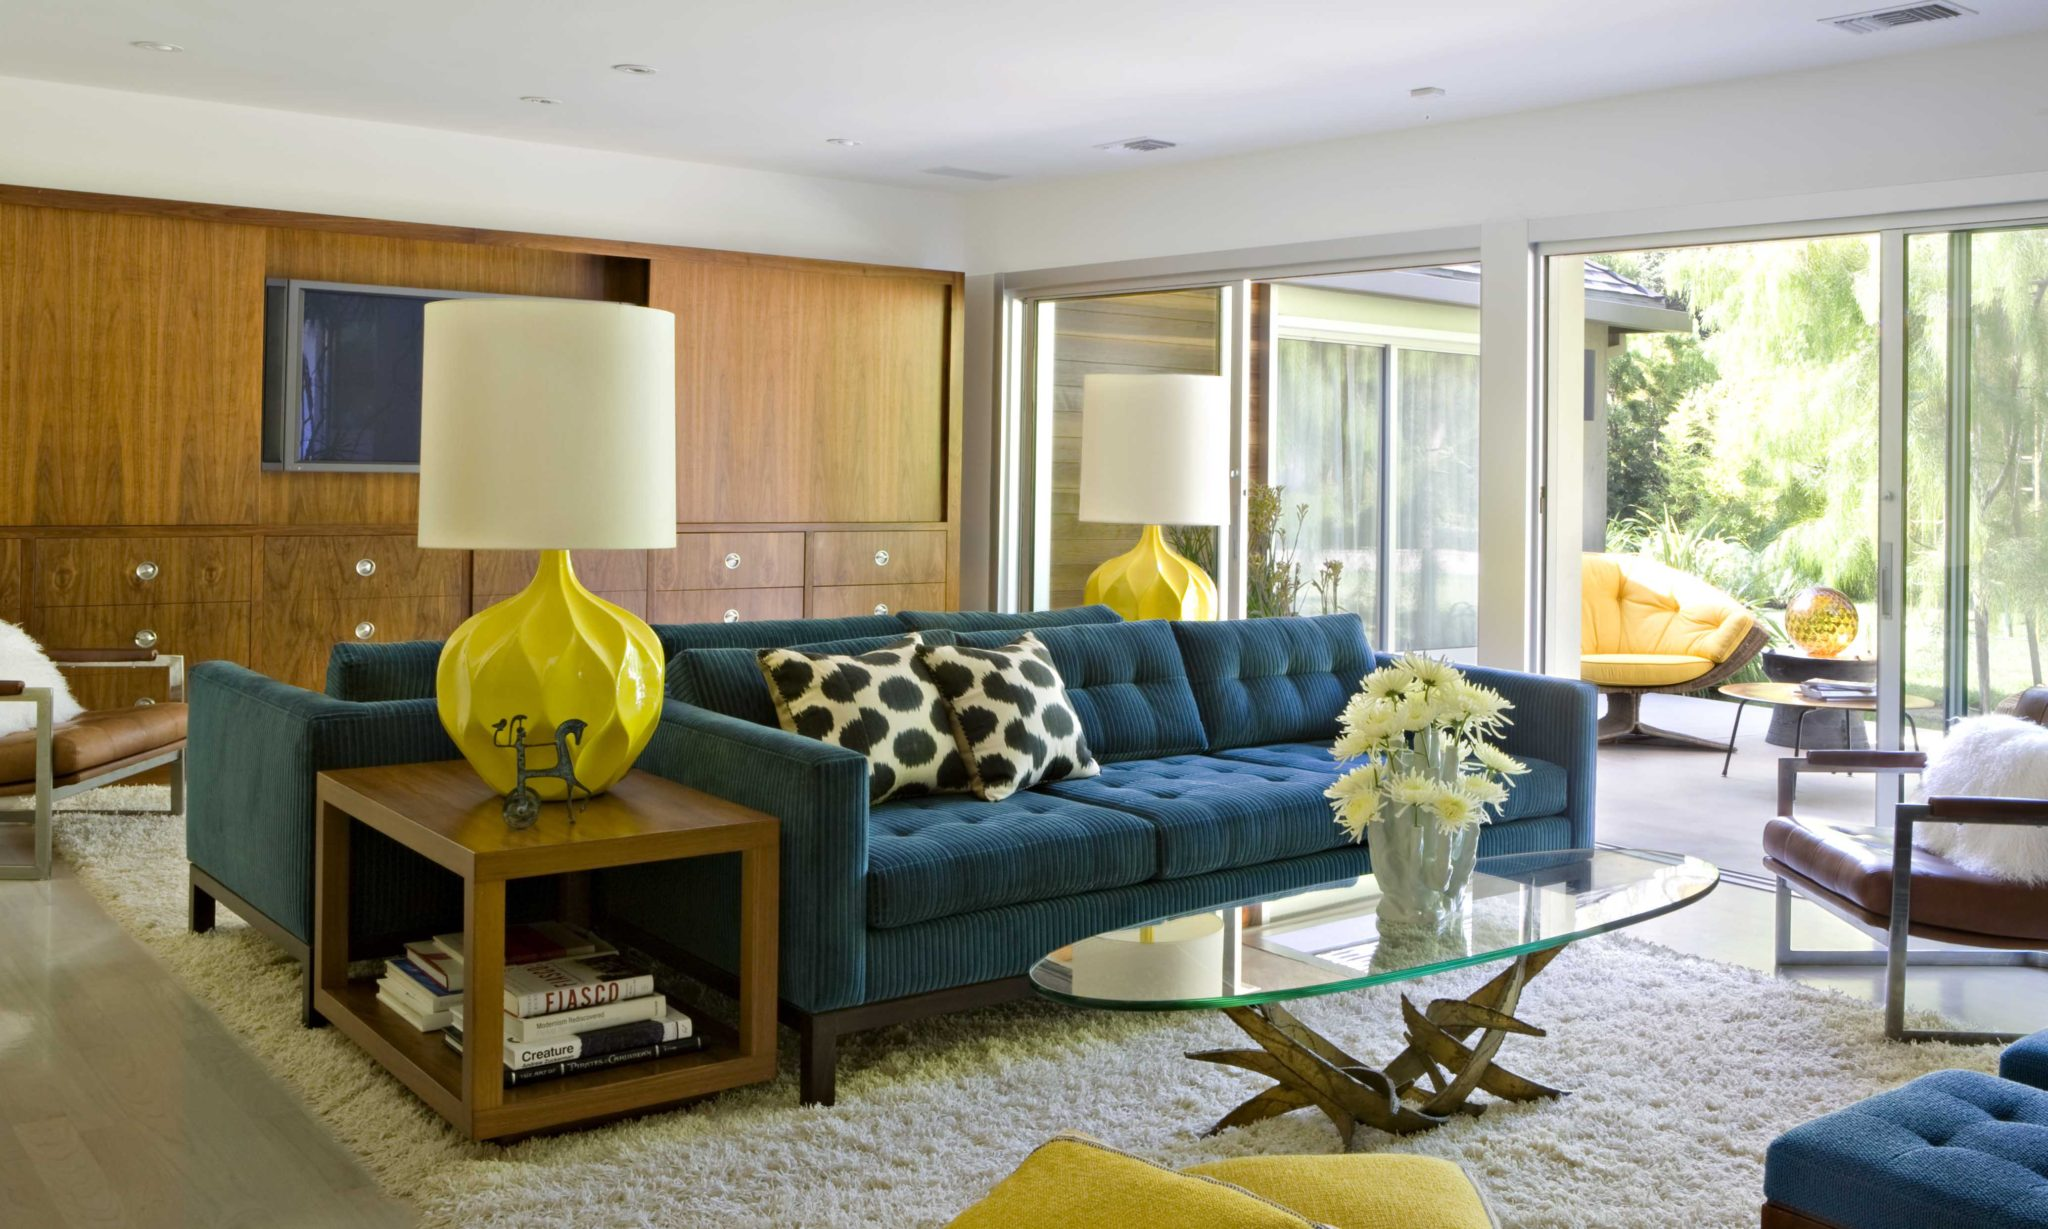 Brentwood modern property by Jamie Bush & Co.